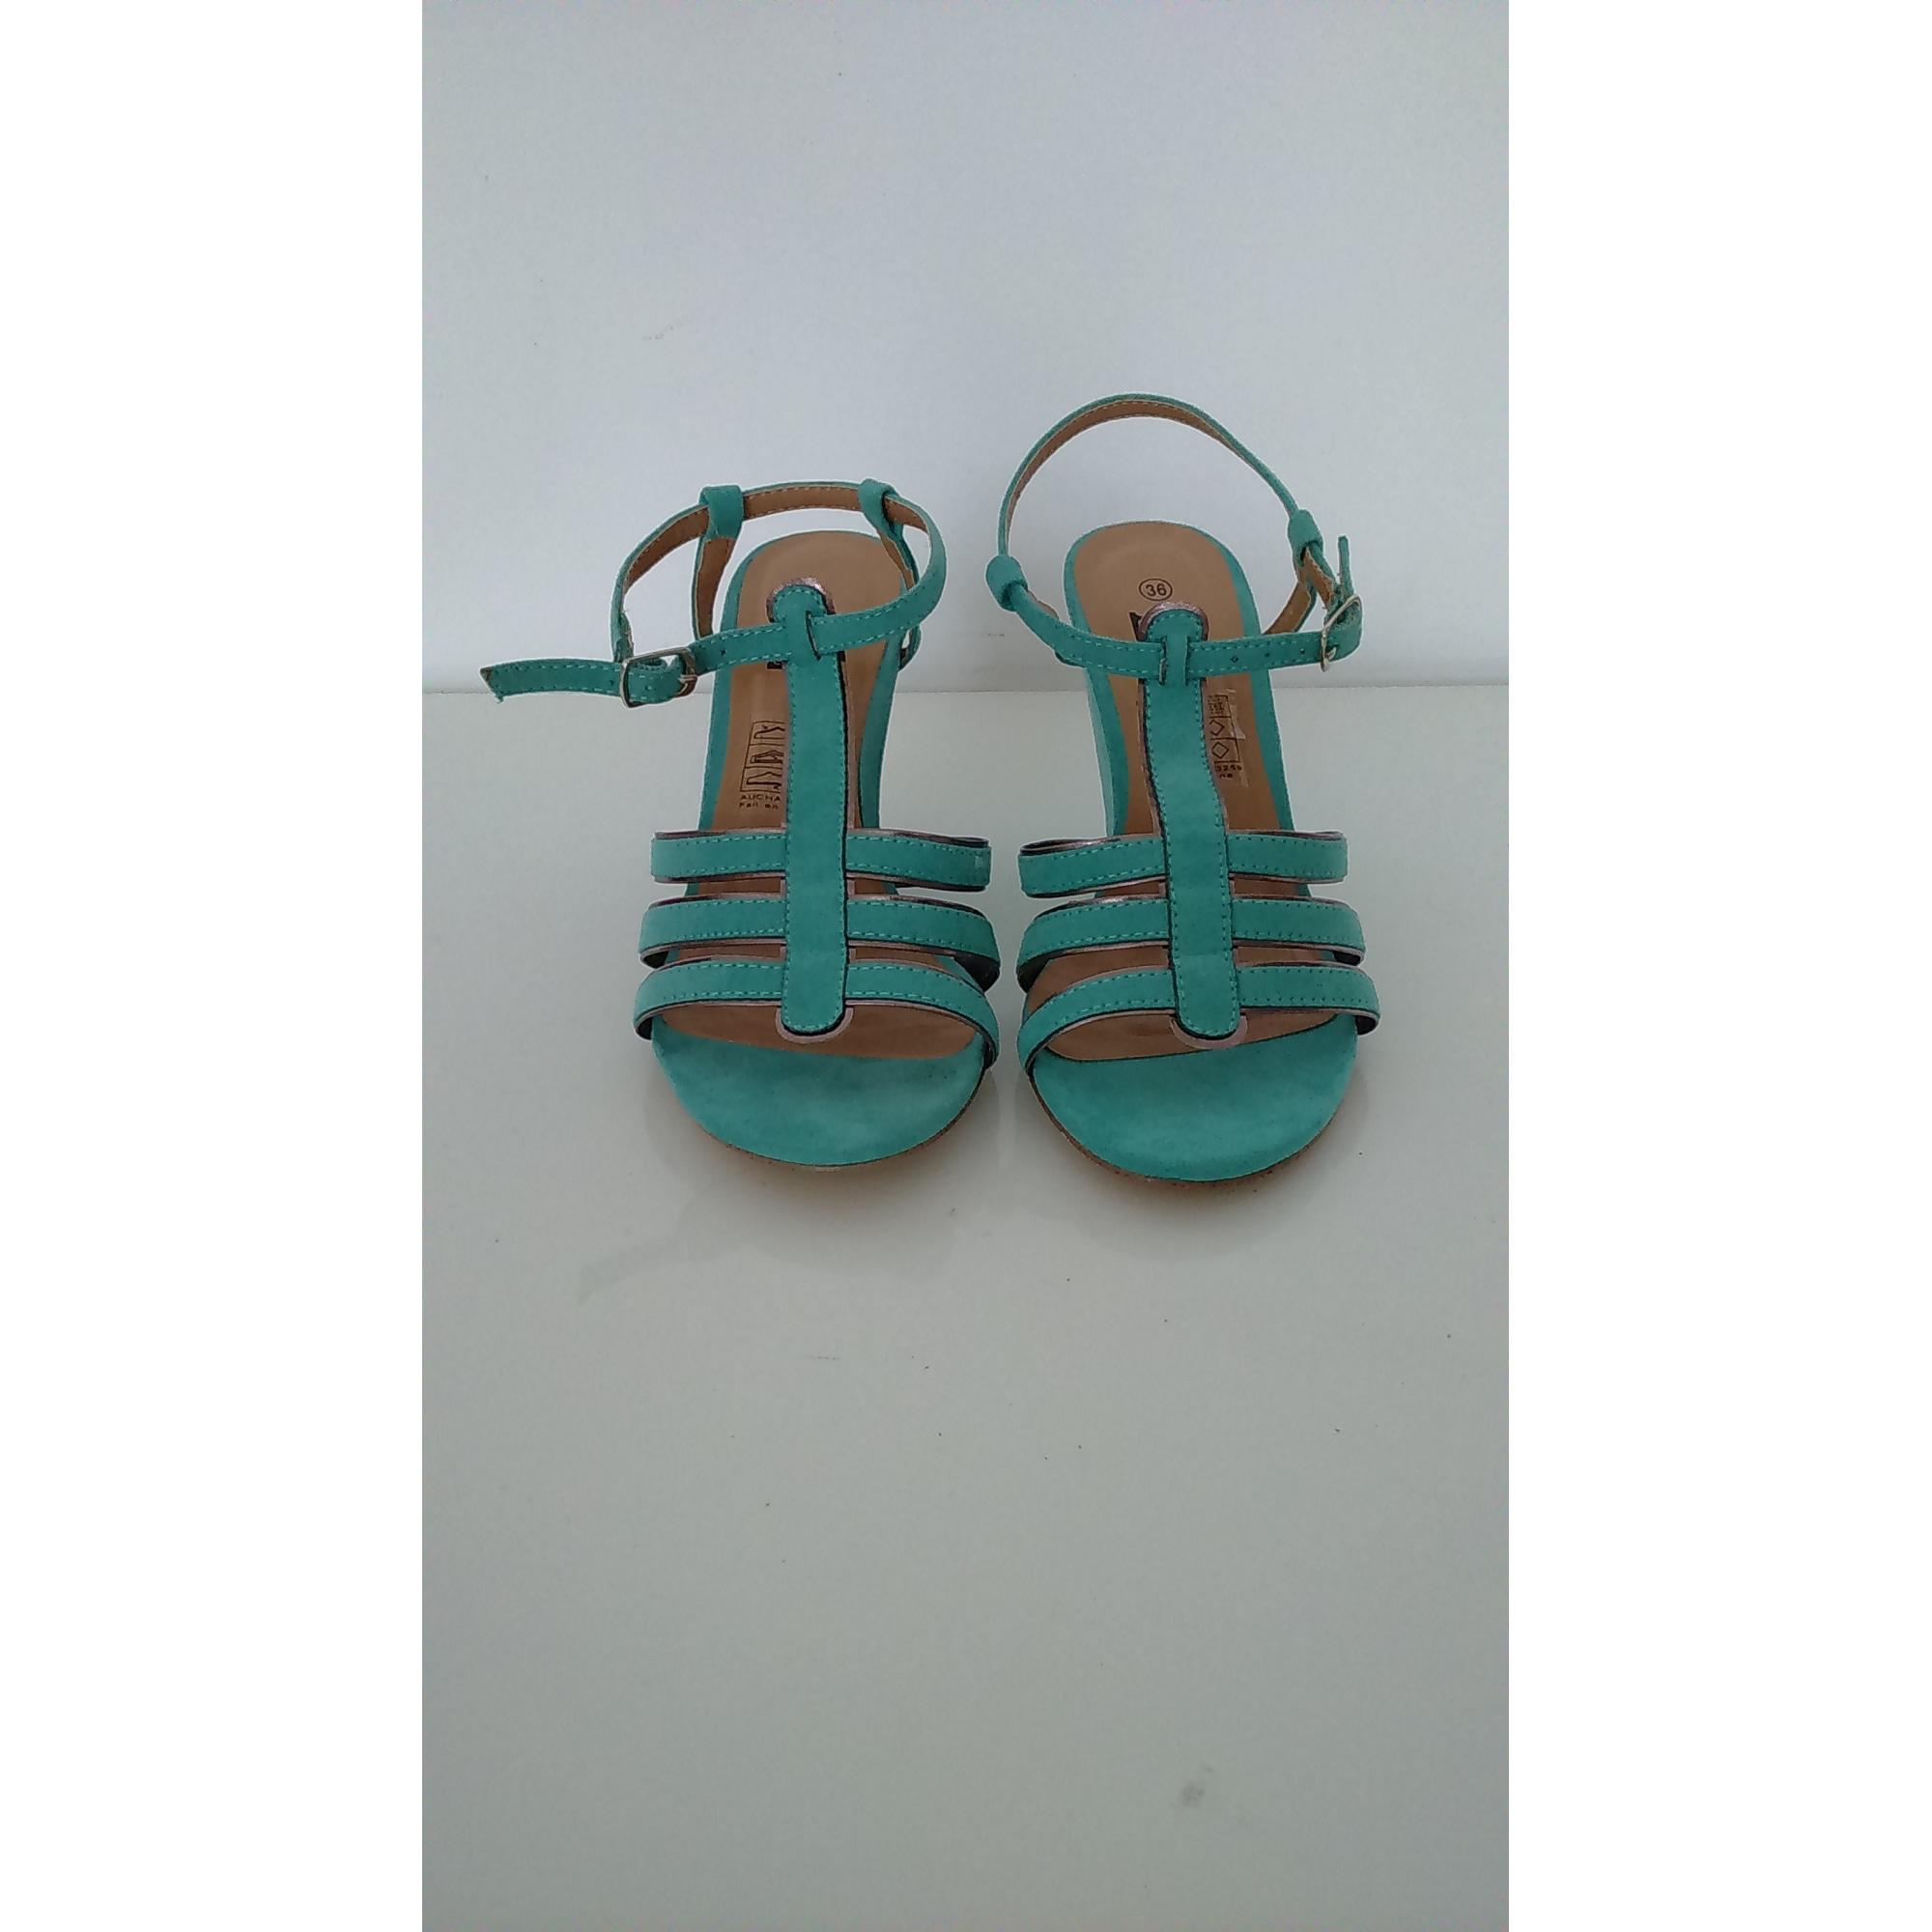 Vert Sandales 36 Compensées 4880951 Extenso In kwZPXuOliT